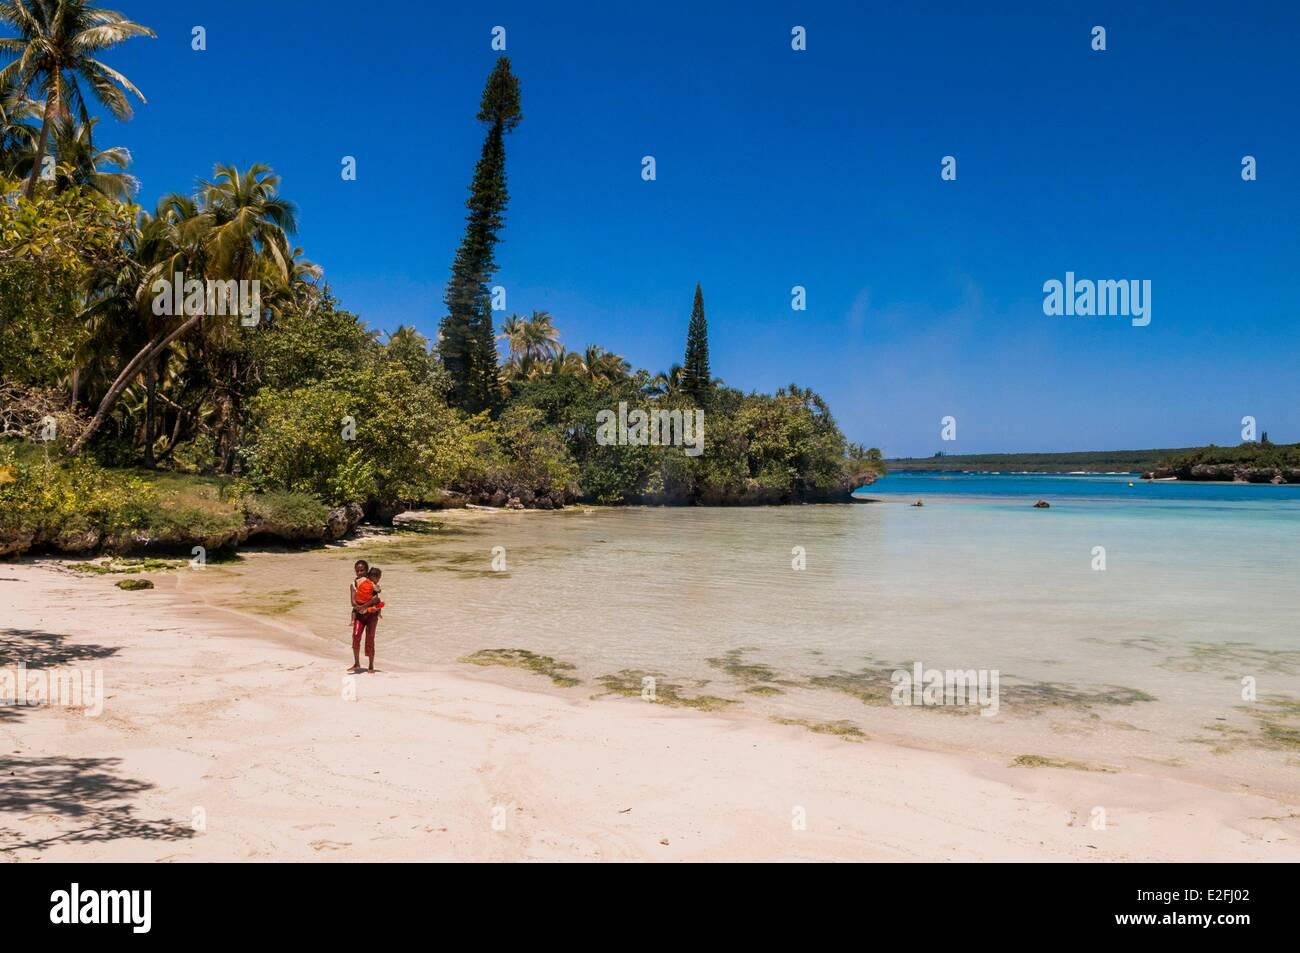 France, New Caledonia, Loyalty island, Lifou island or Drehu, south part of island, Luengoni bay and beach - Stock Image